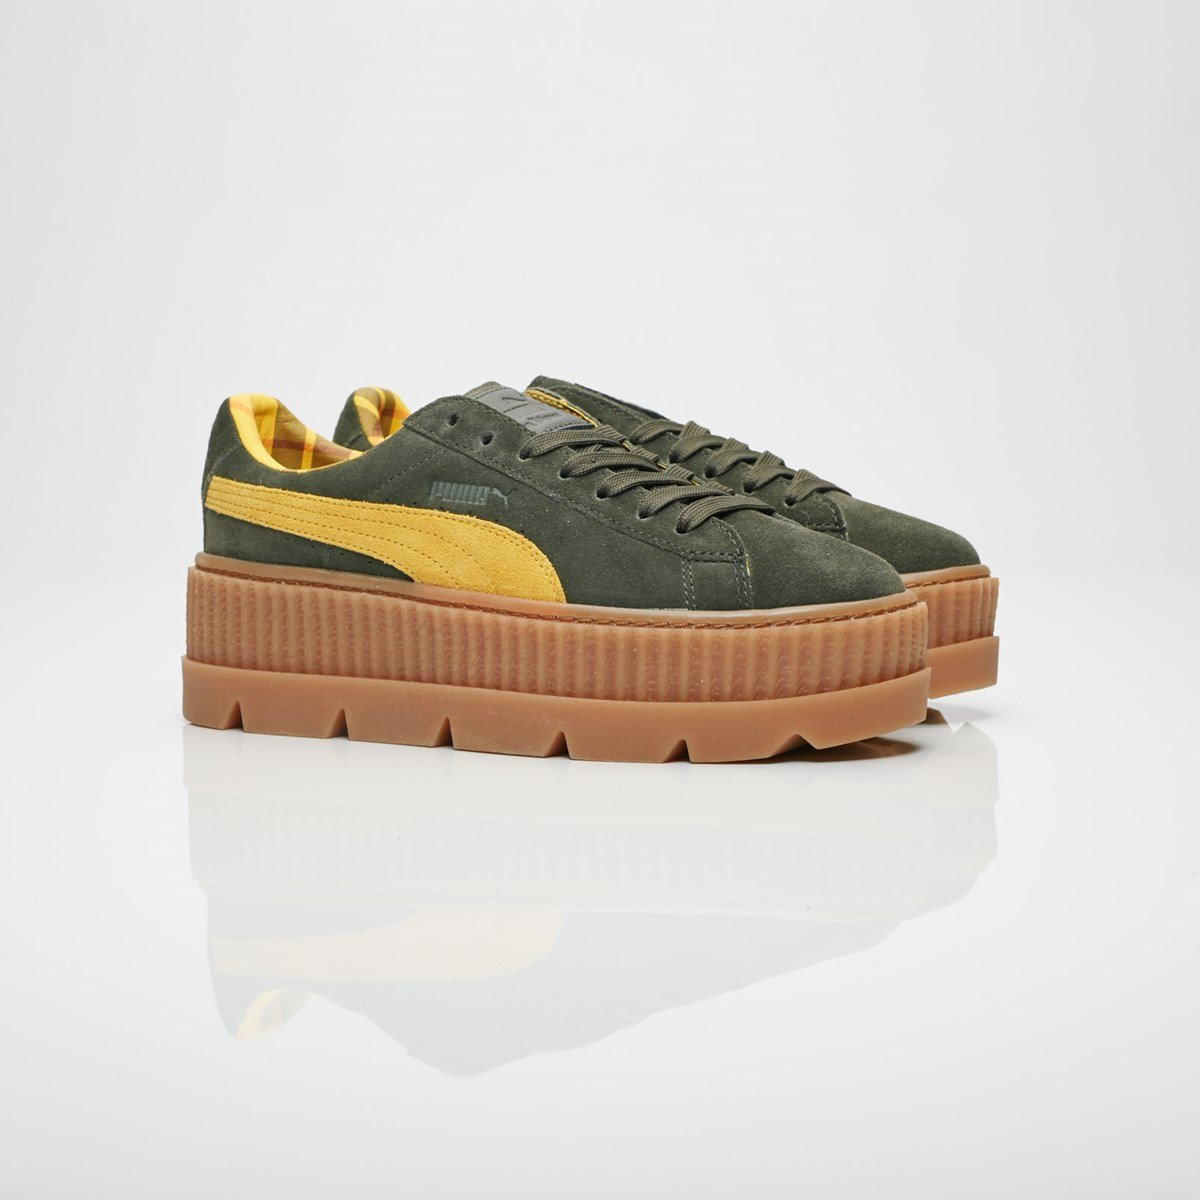 39ef399e8ca1b8 puma cleated creeper suede wns 366268 01 sneakers   streetwear på nätet sen  199. SNEAKERSNSTUFF